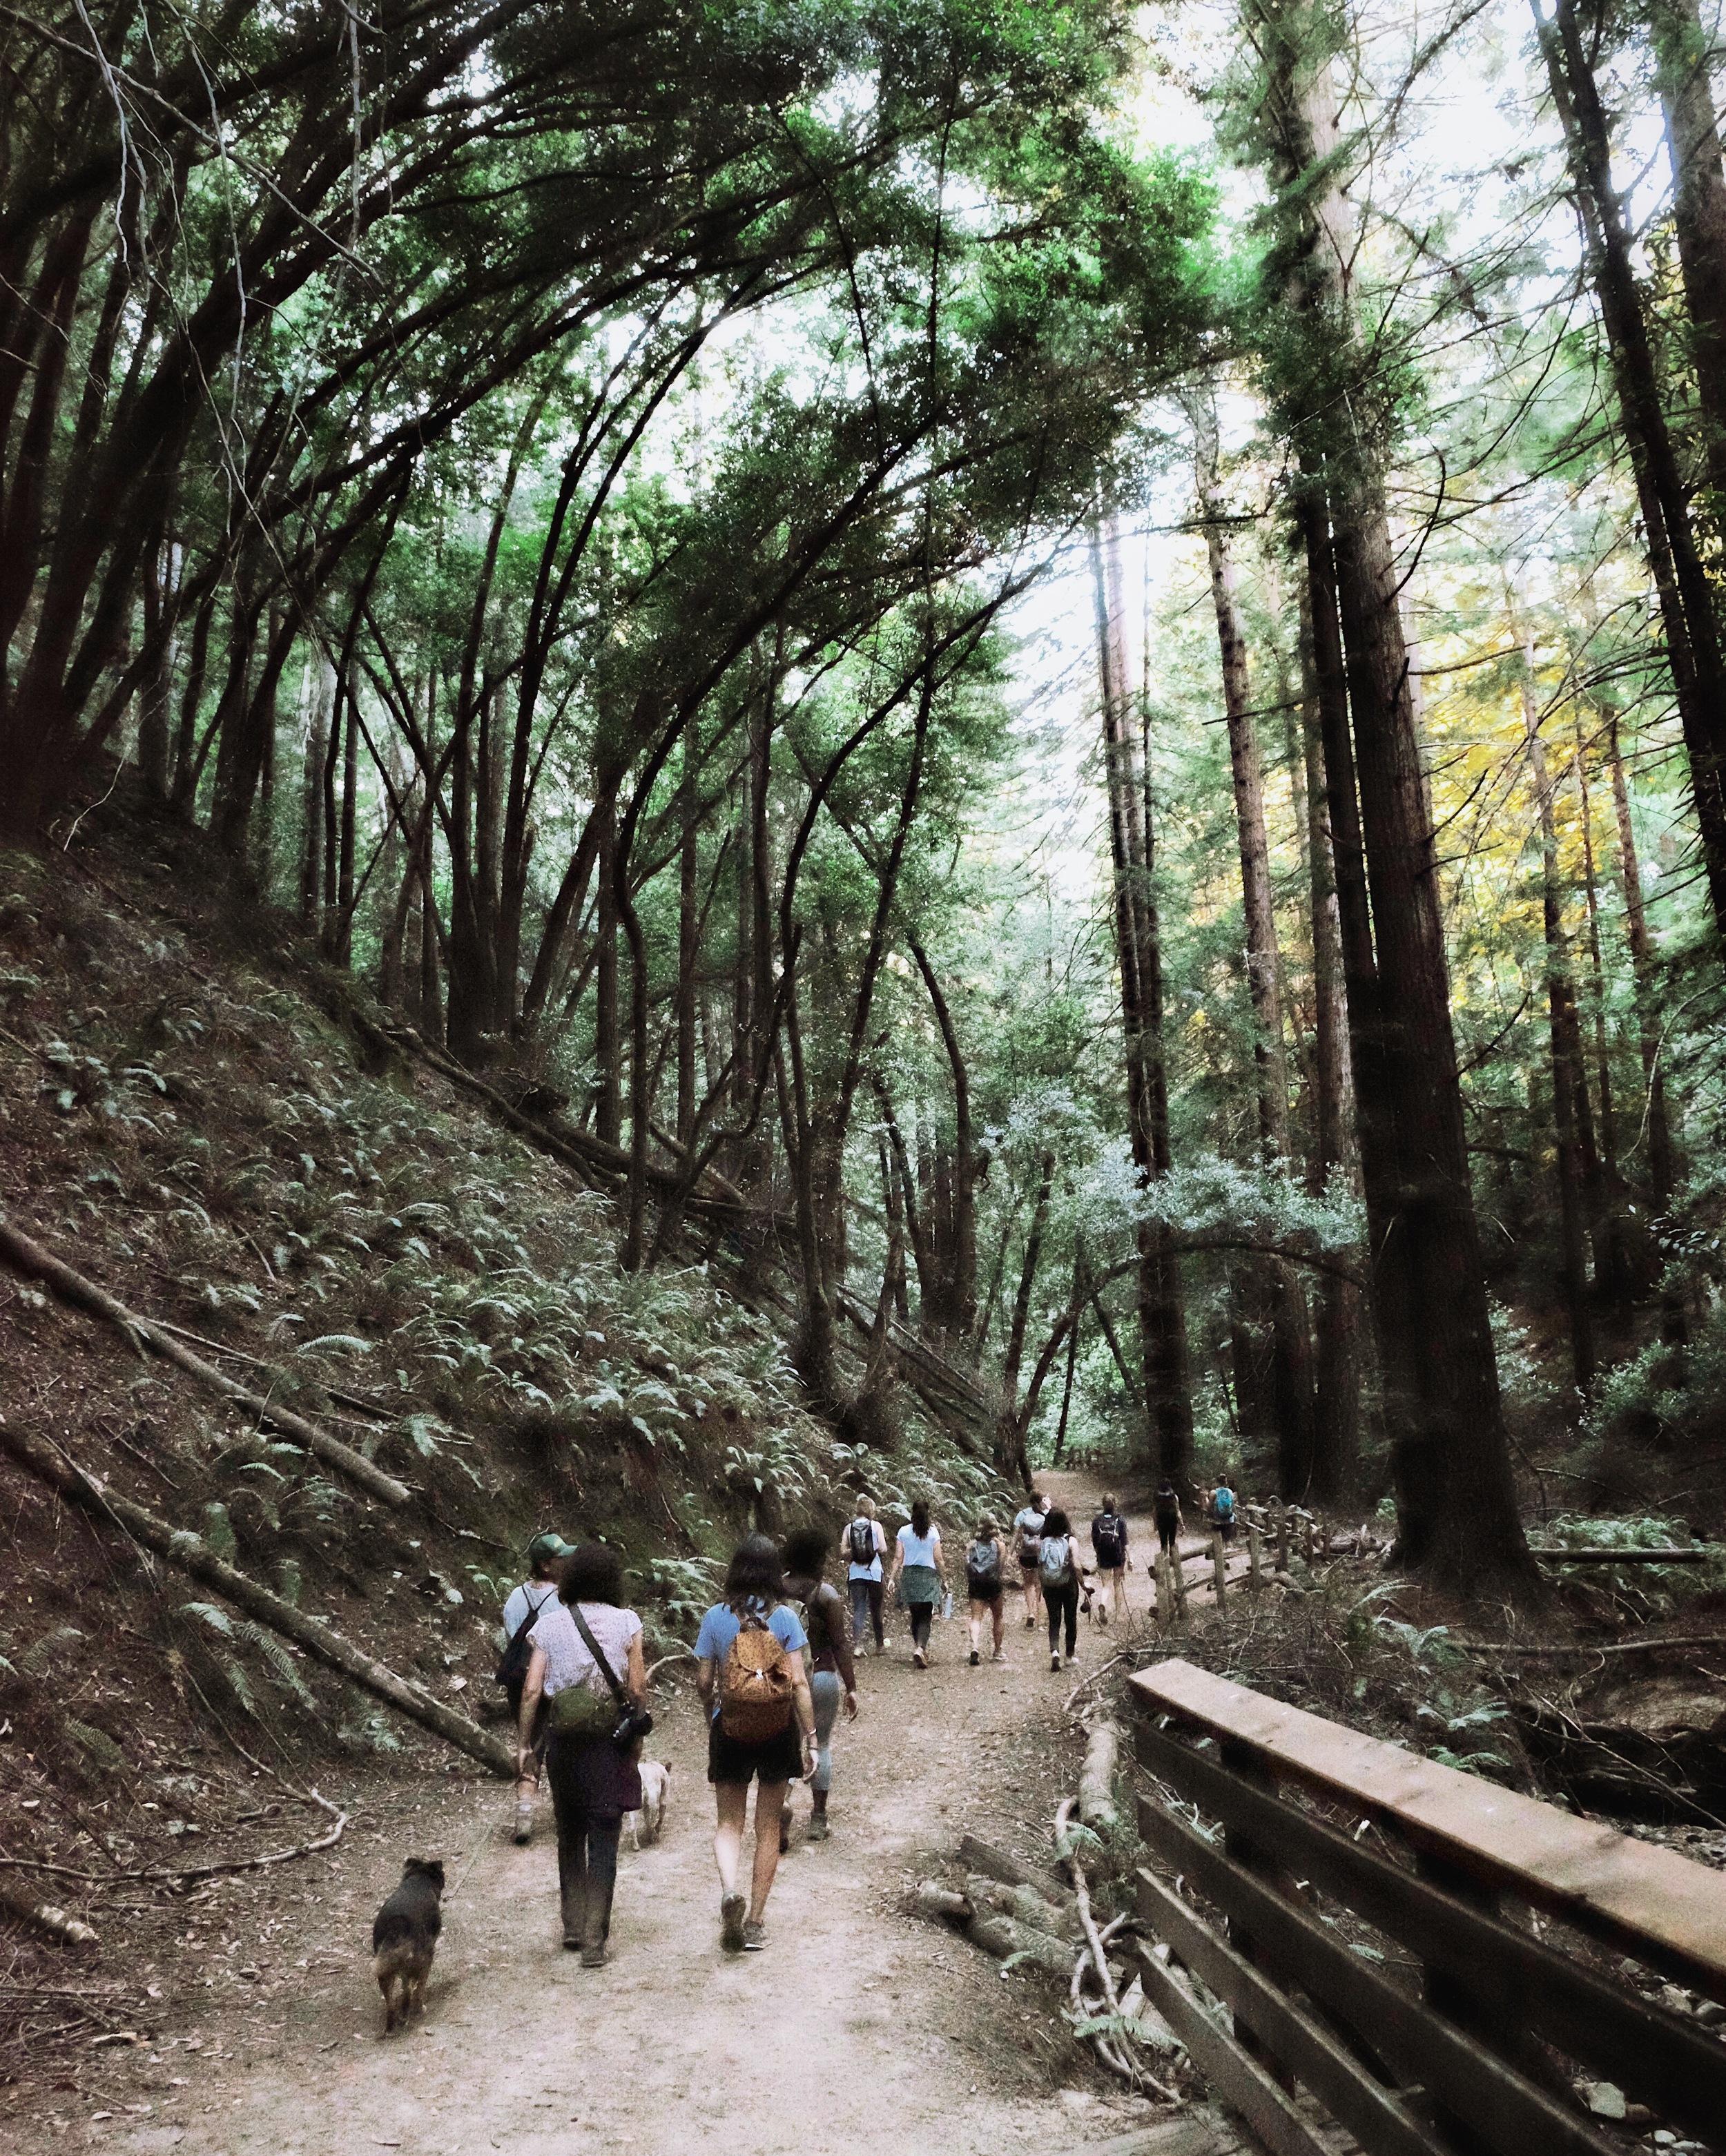 she-explores-oakland-redwood-regional-park.jpg